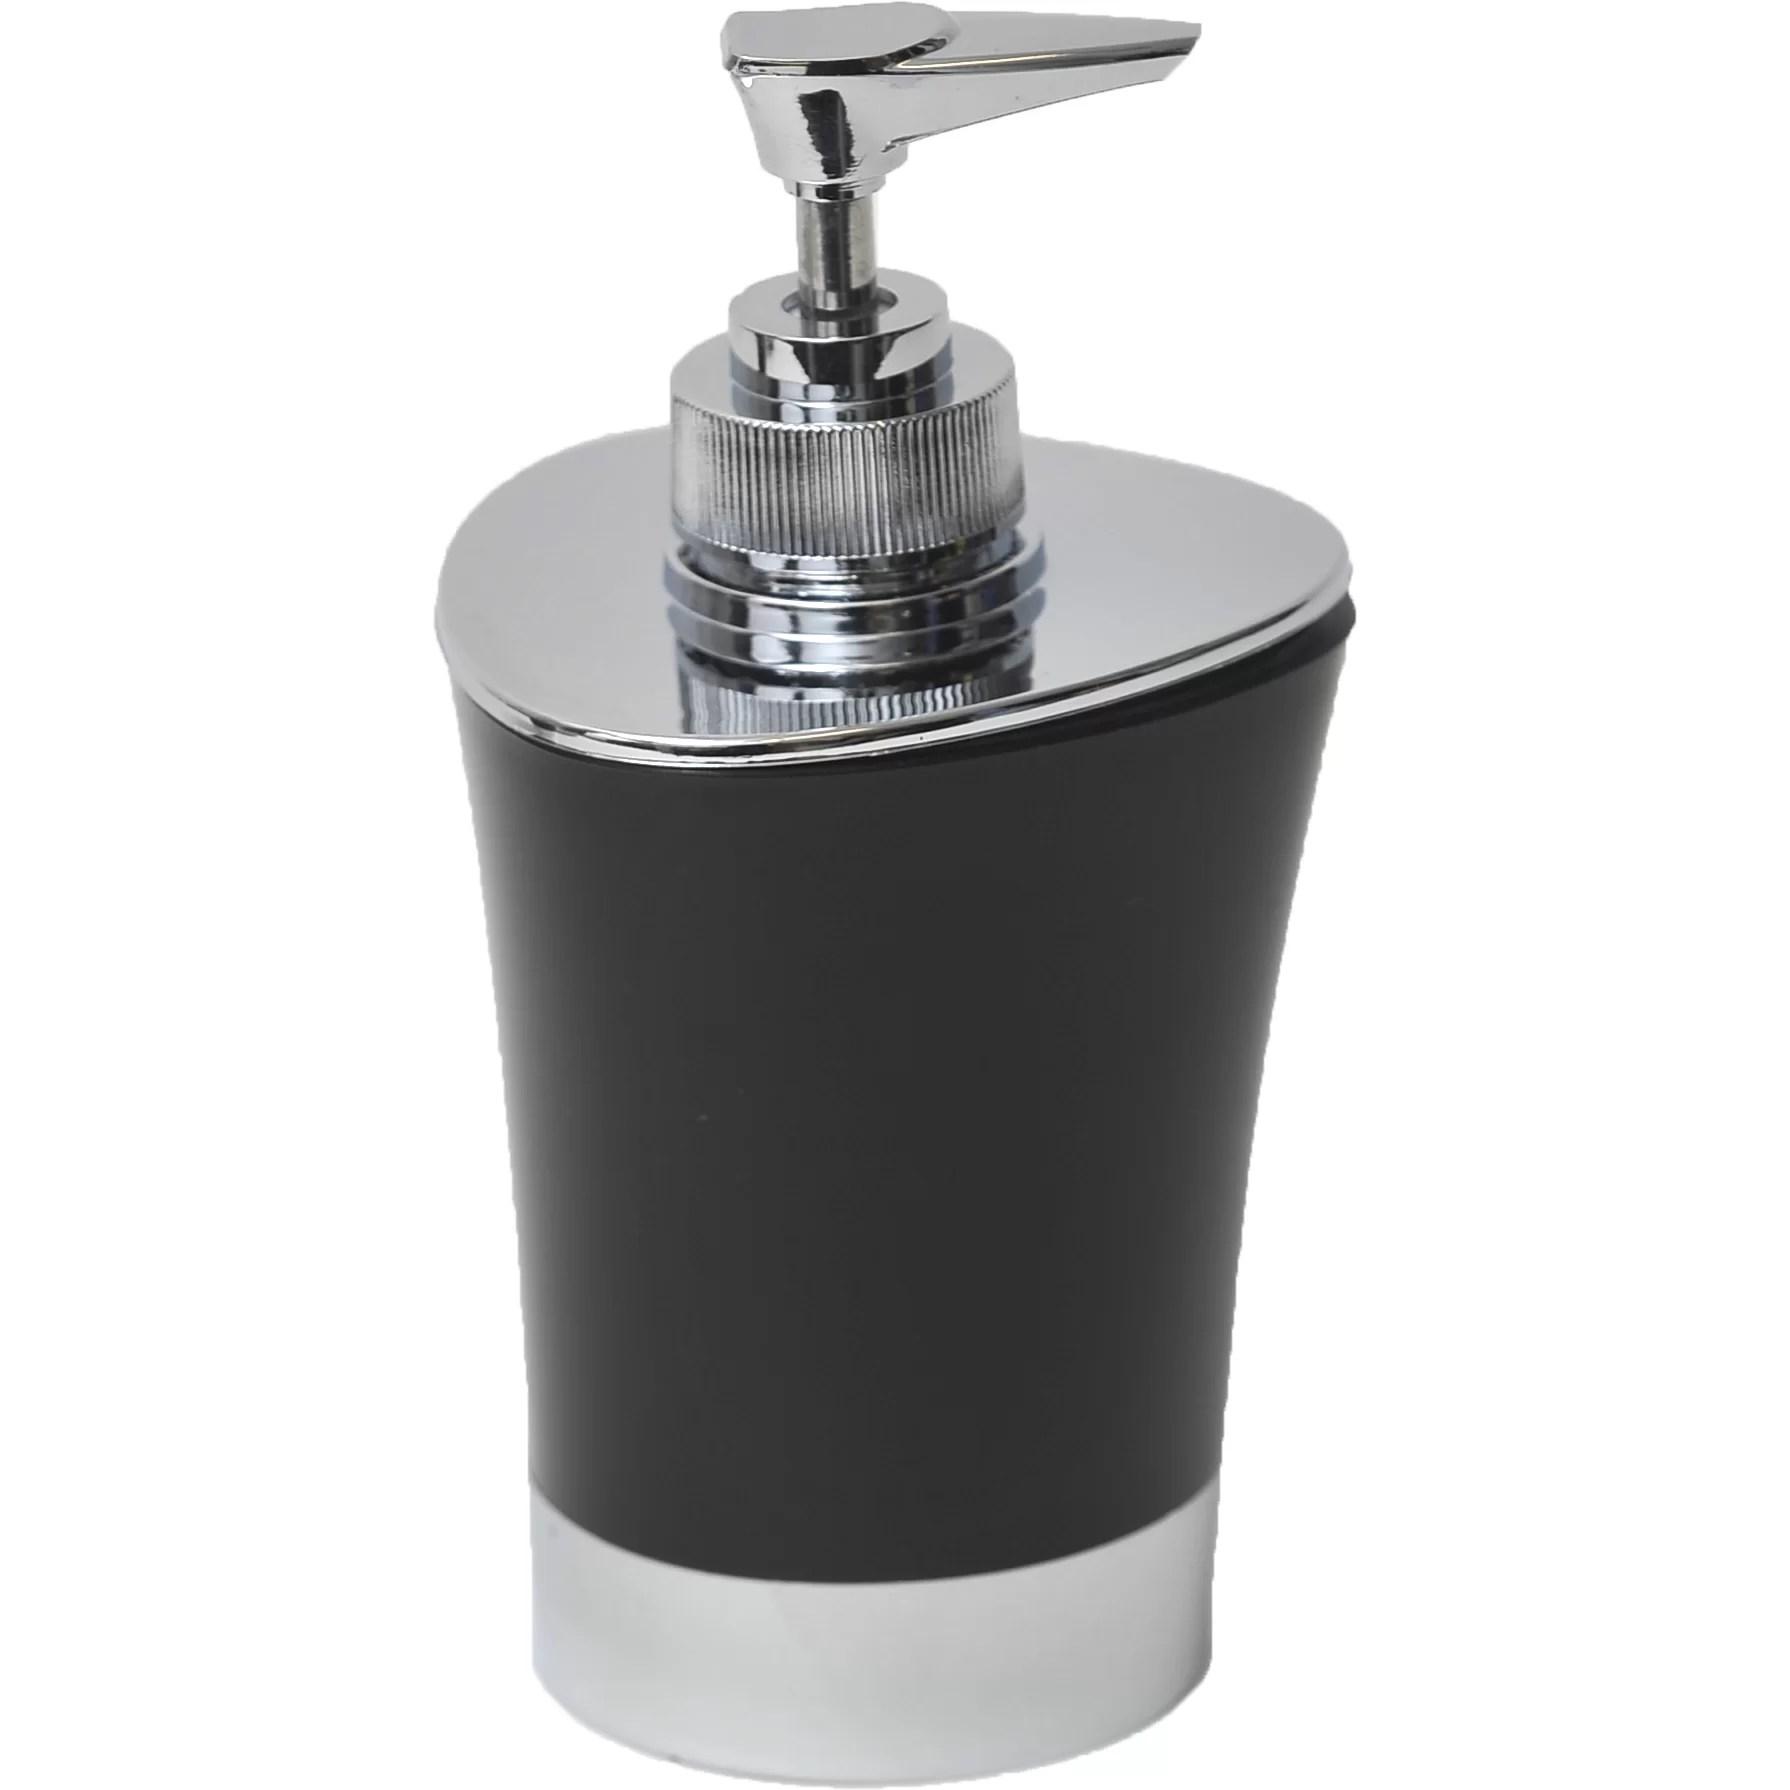 Evideco Bathroom Soap and Lotion Dispenser  Reviews  Wayfair